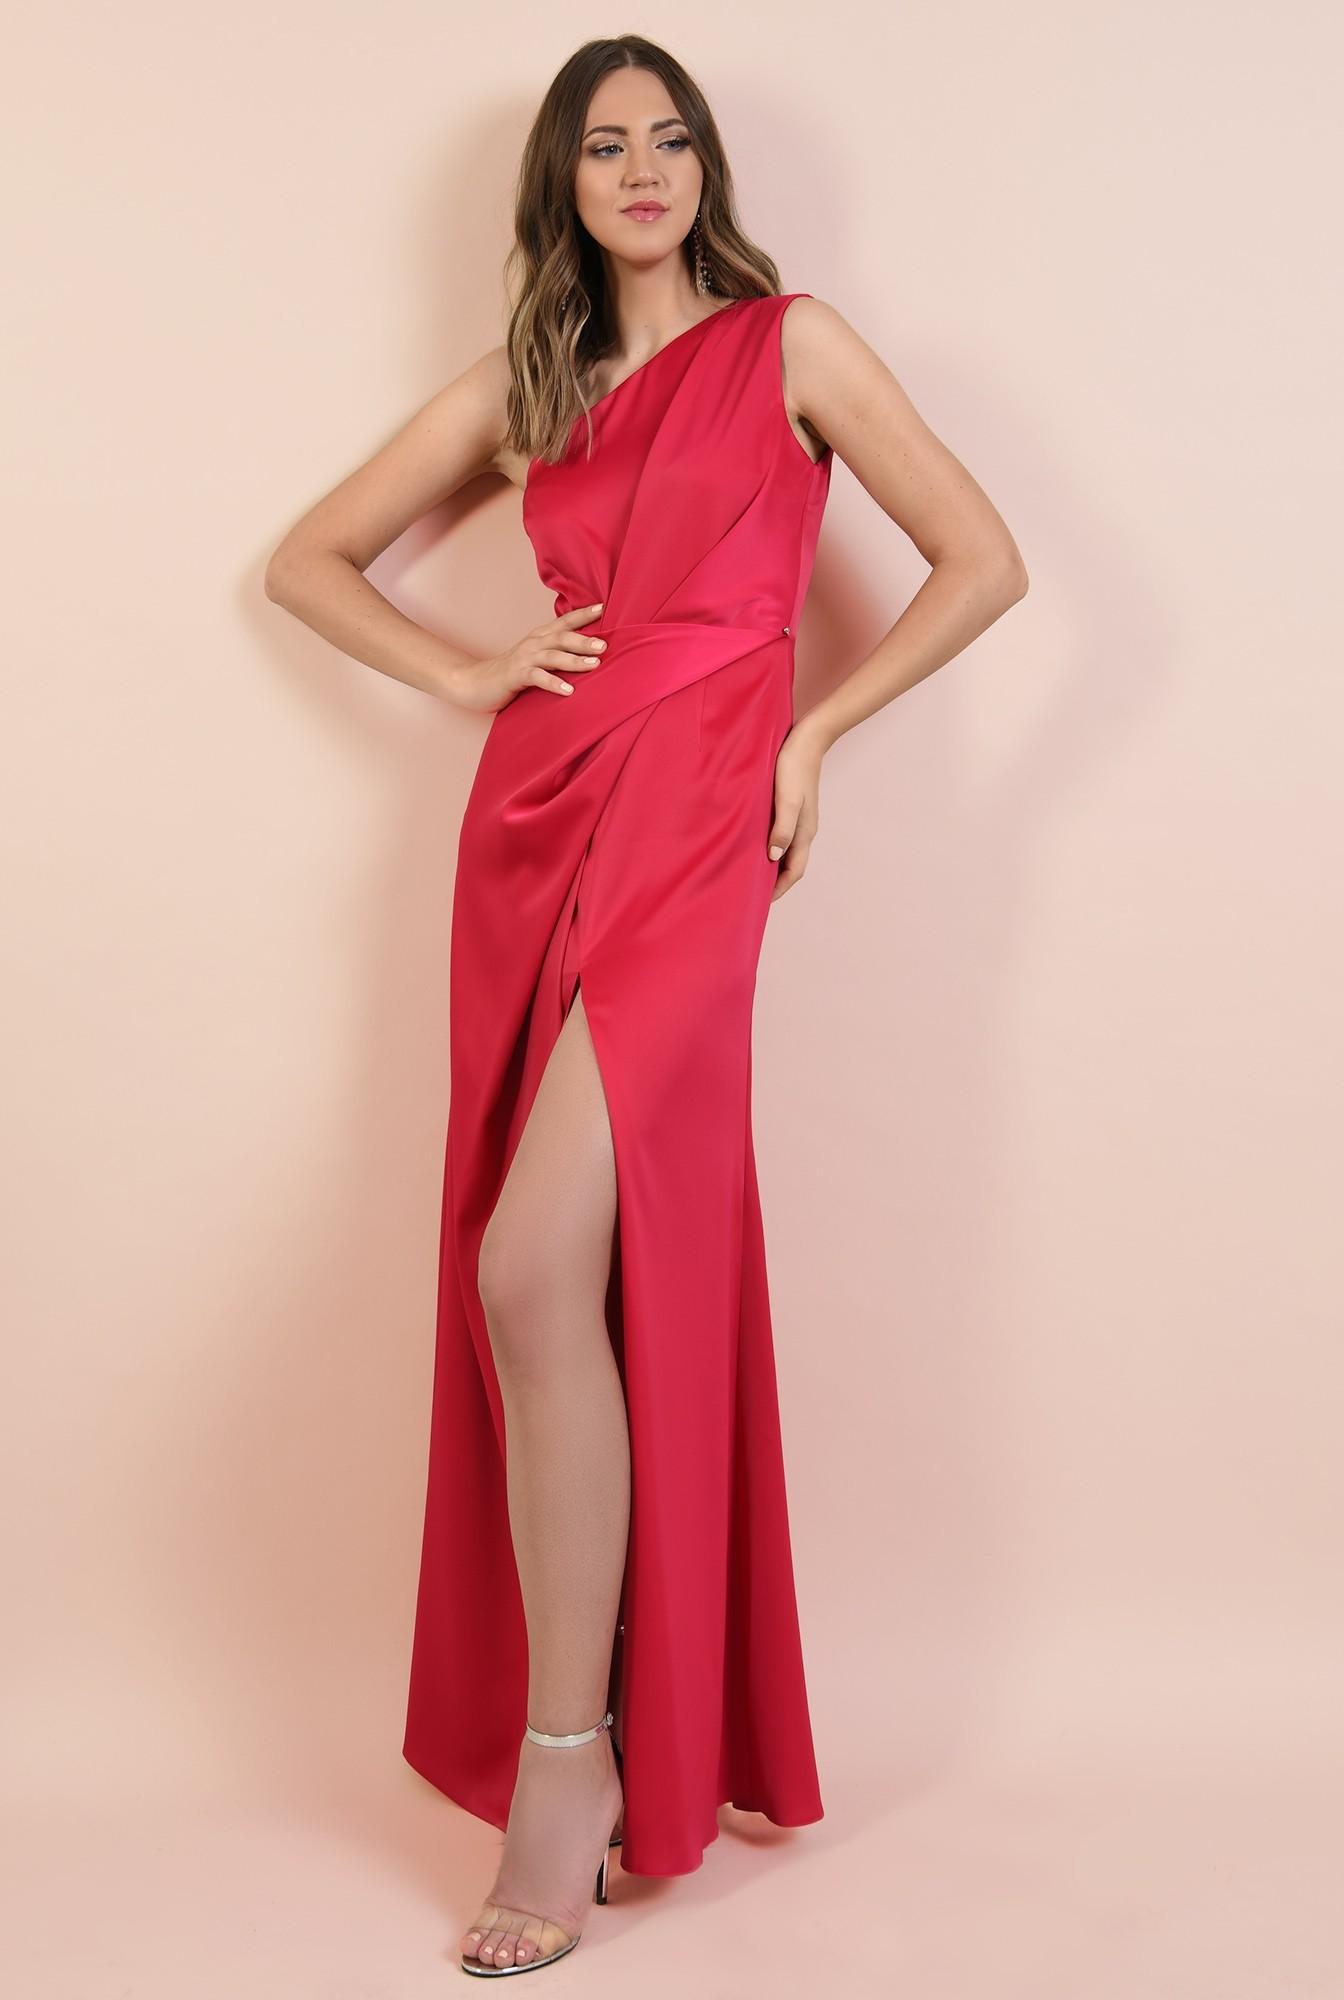 3 - rochie eleganta, lunga, cu slit adanc, cusatura in talie